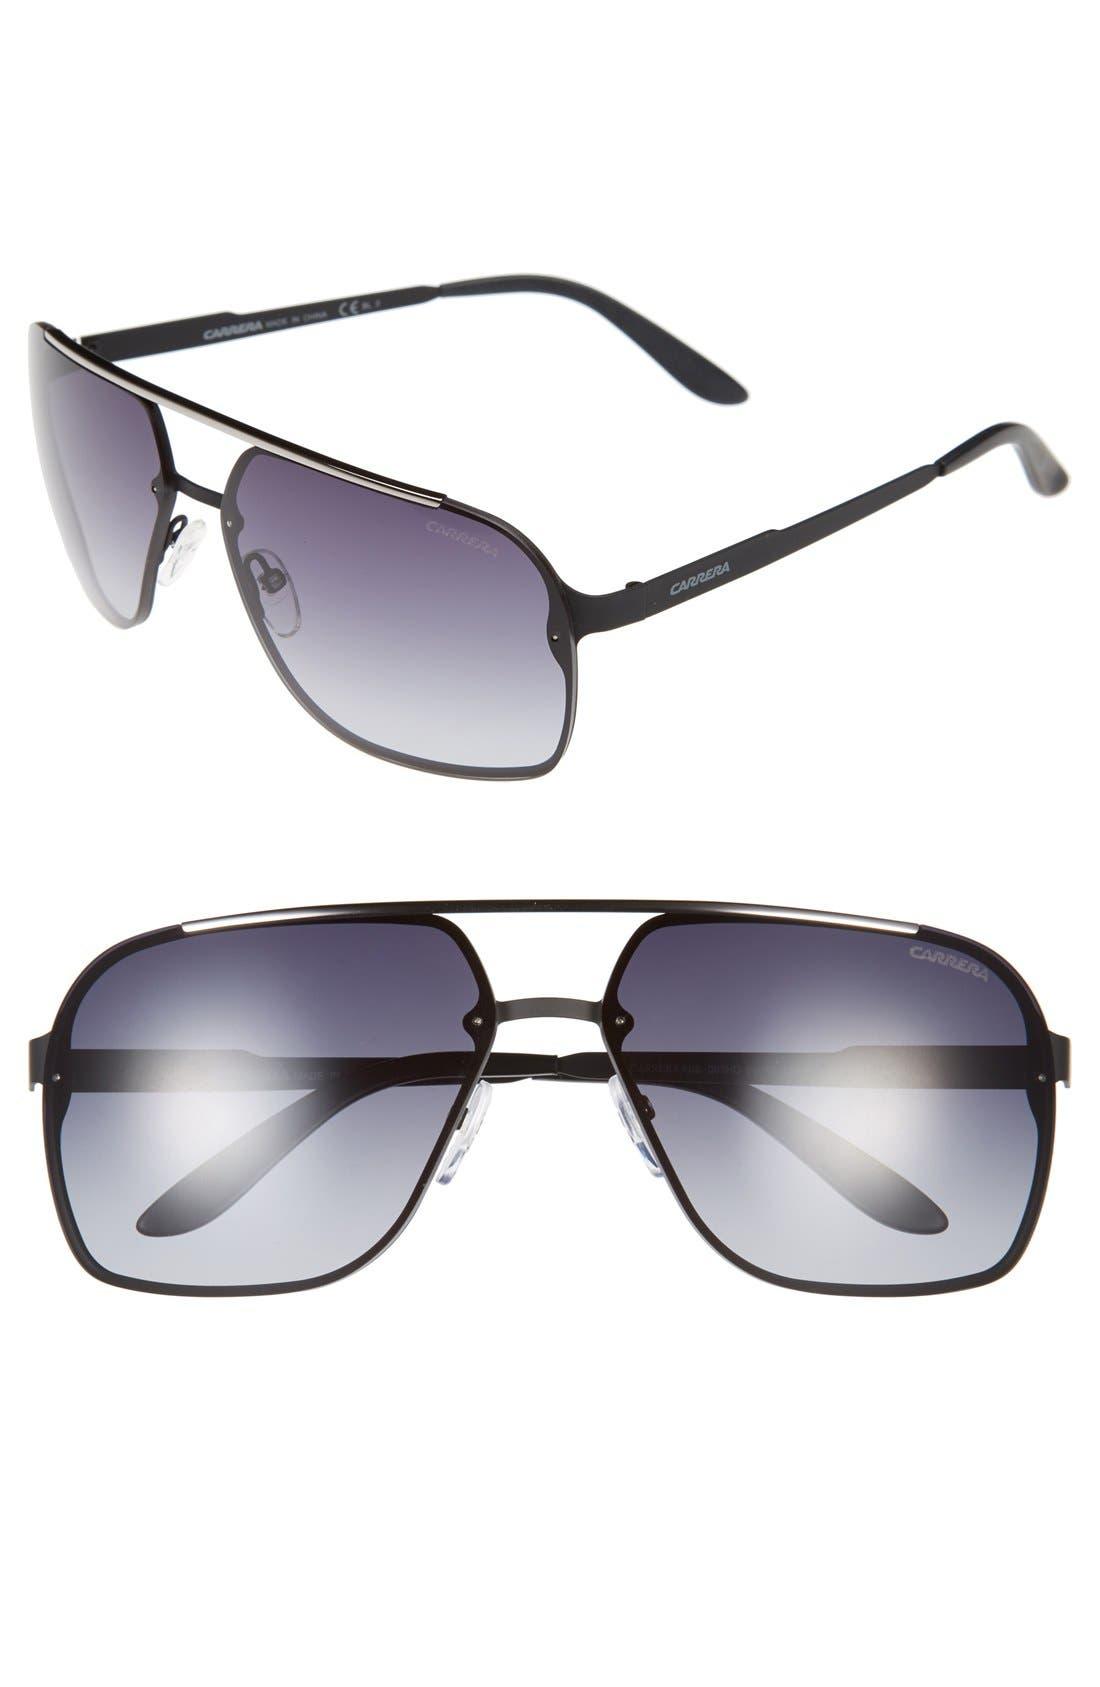 64mm Navigator Sunglasses,                         Main,                         color, MATTE BLACK/ GREY GRADIENT